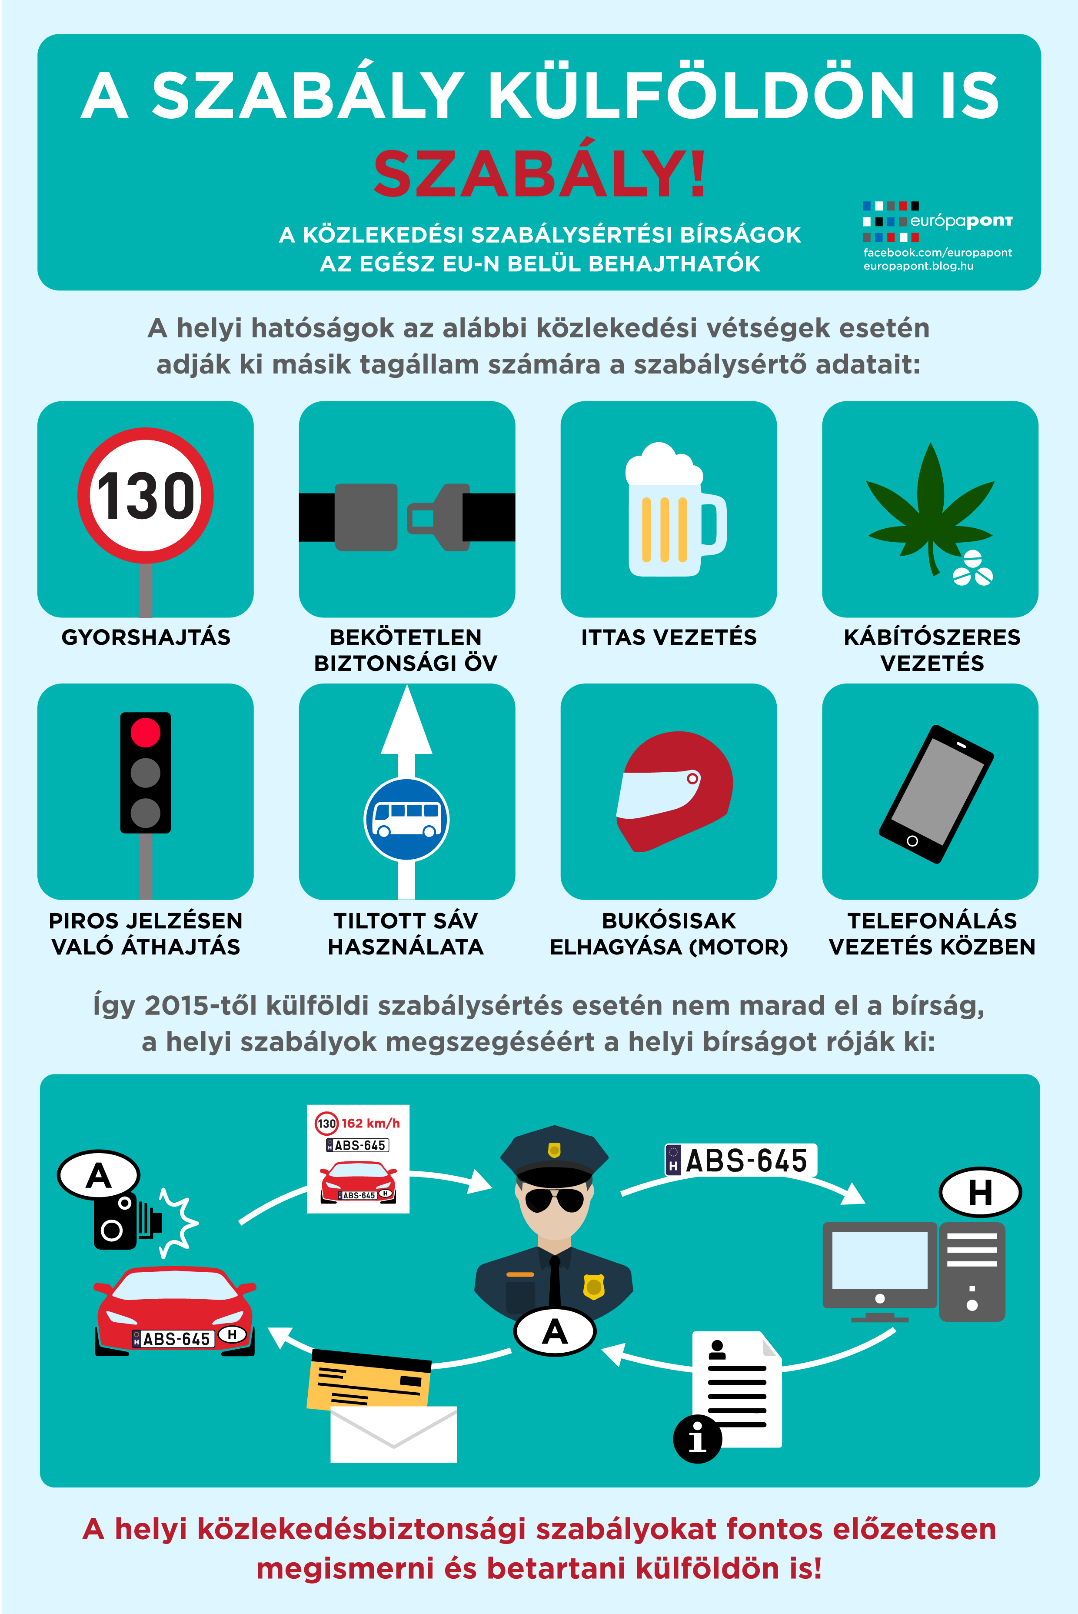 kozlekedesi_birsagok_infografika.png